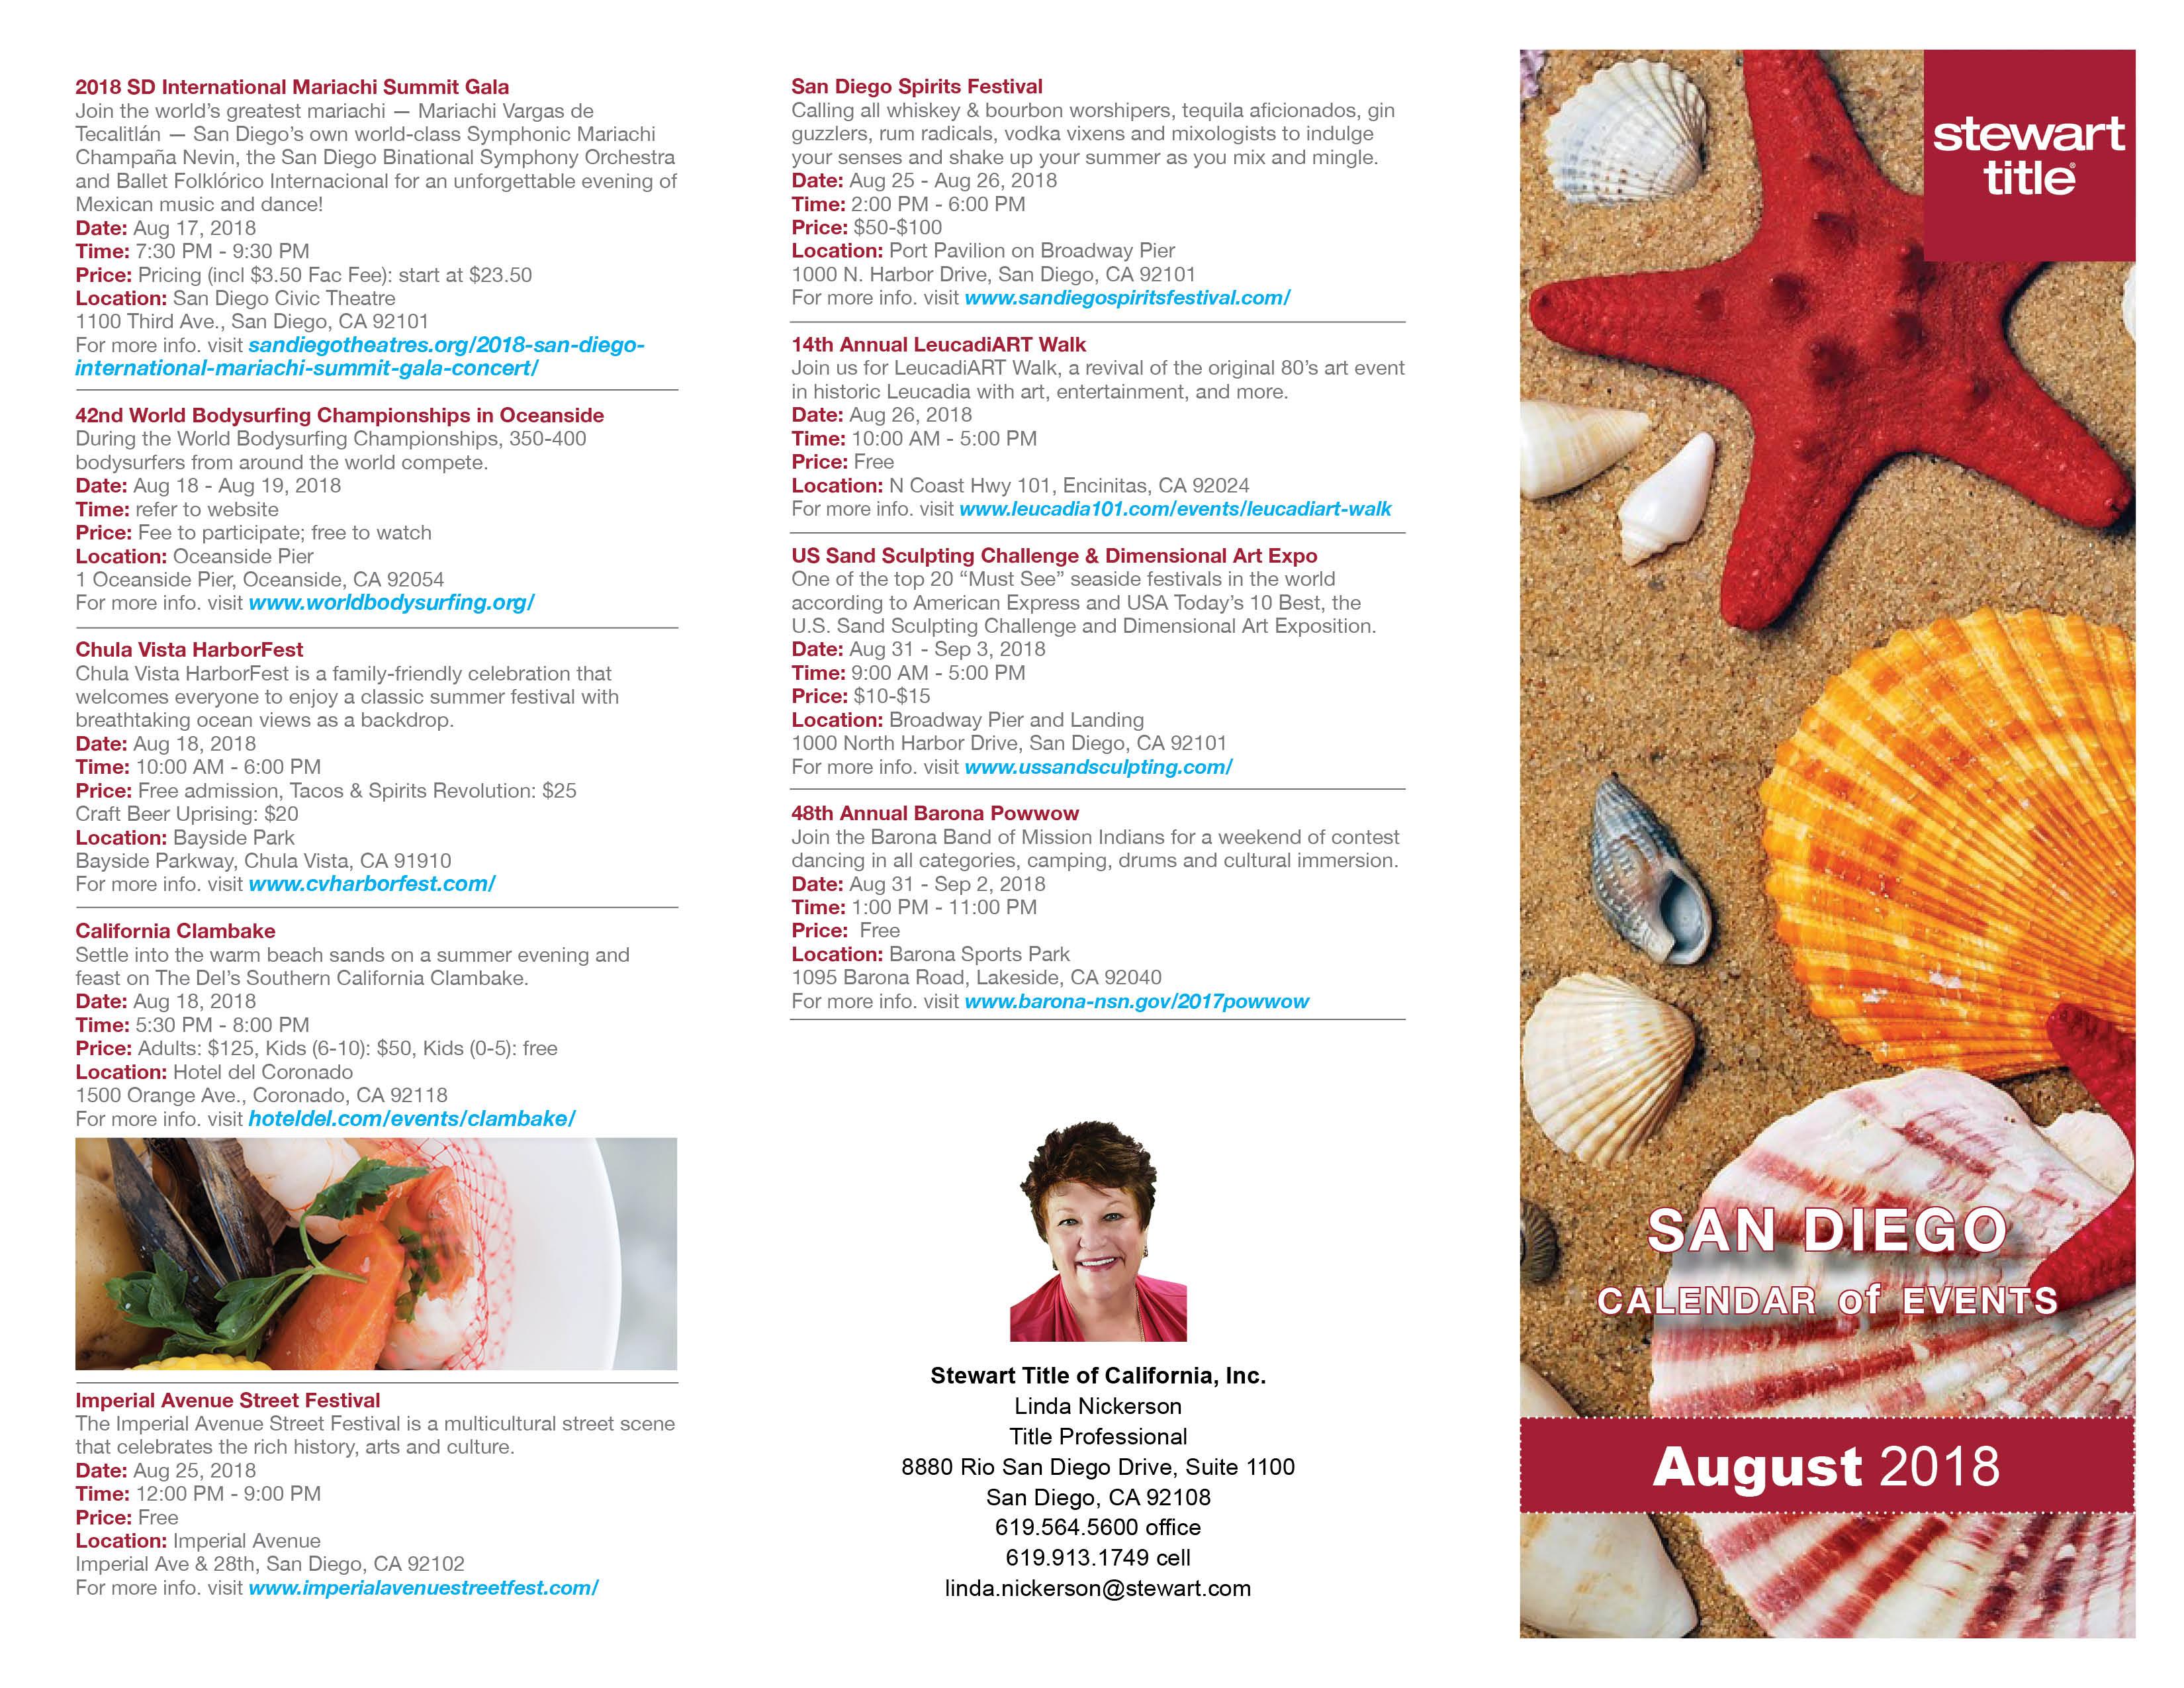 Calendar events SD August 2018-Linda Nickerson